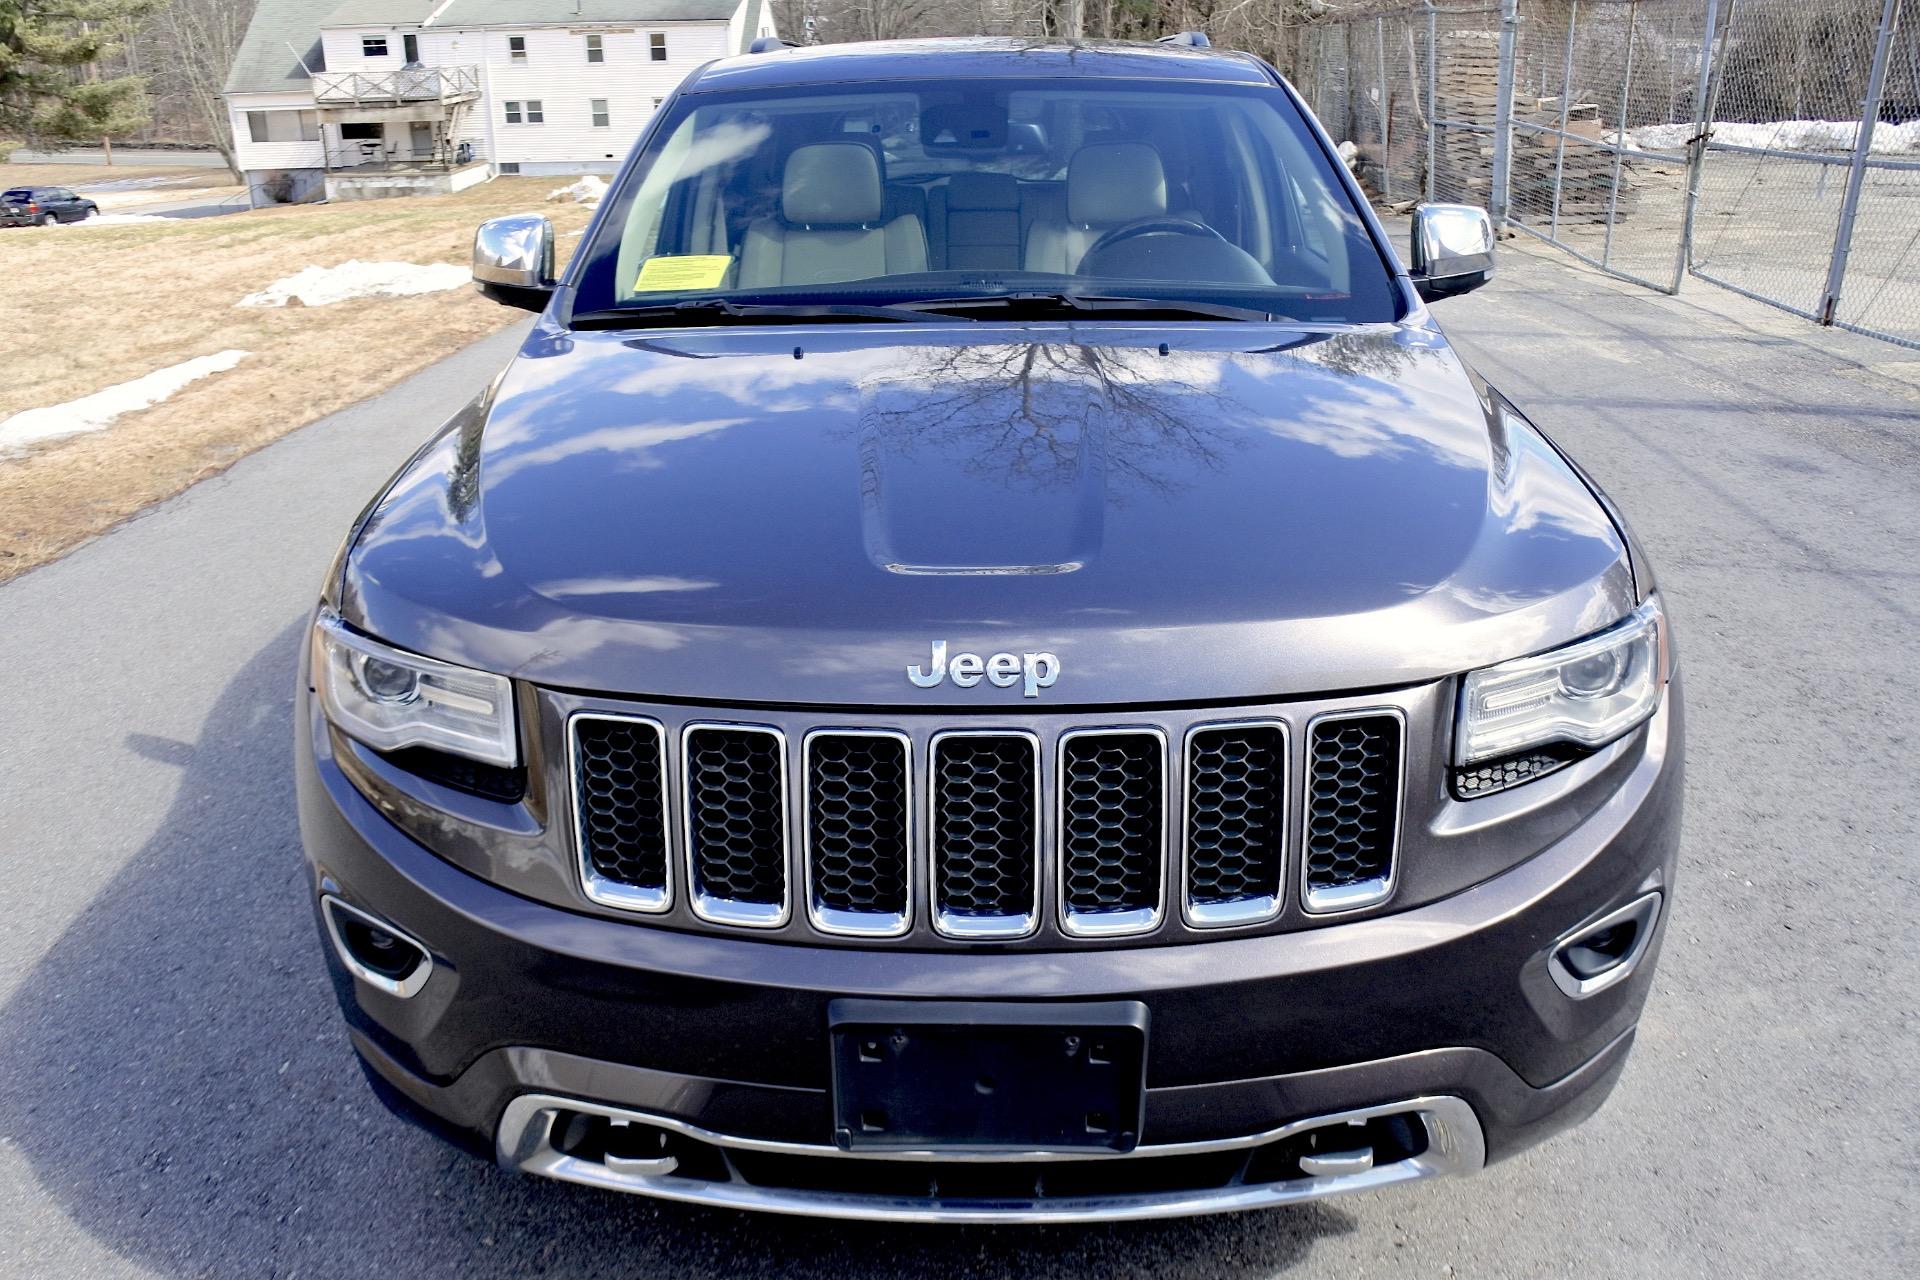 Used 2014 Jeep Grand Cherokee Overland 4WD Used 2014 Jeep Grand Cherokee Overland 4WD for sale  at Metro West Motorcars LLC in Shrewsbury MA 8